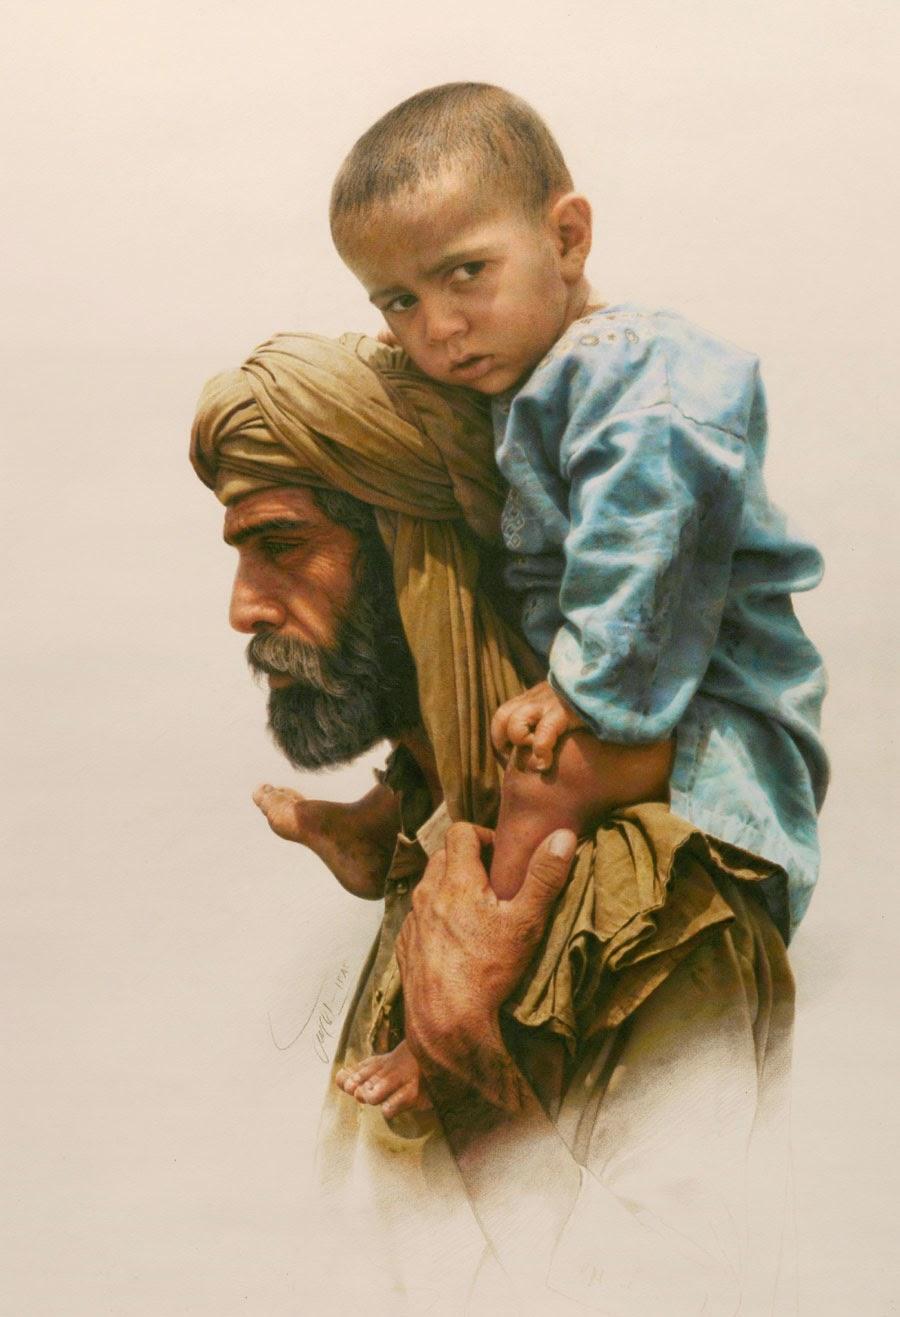 Emigrante - Iman Maleki e suas pinturas realistas ~ Pintor iraniano